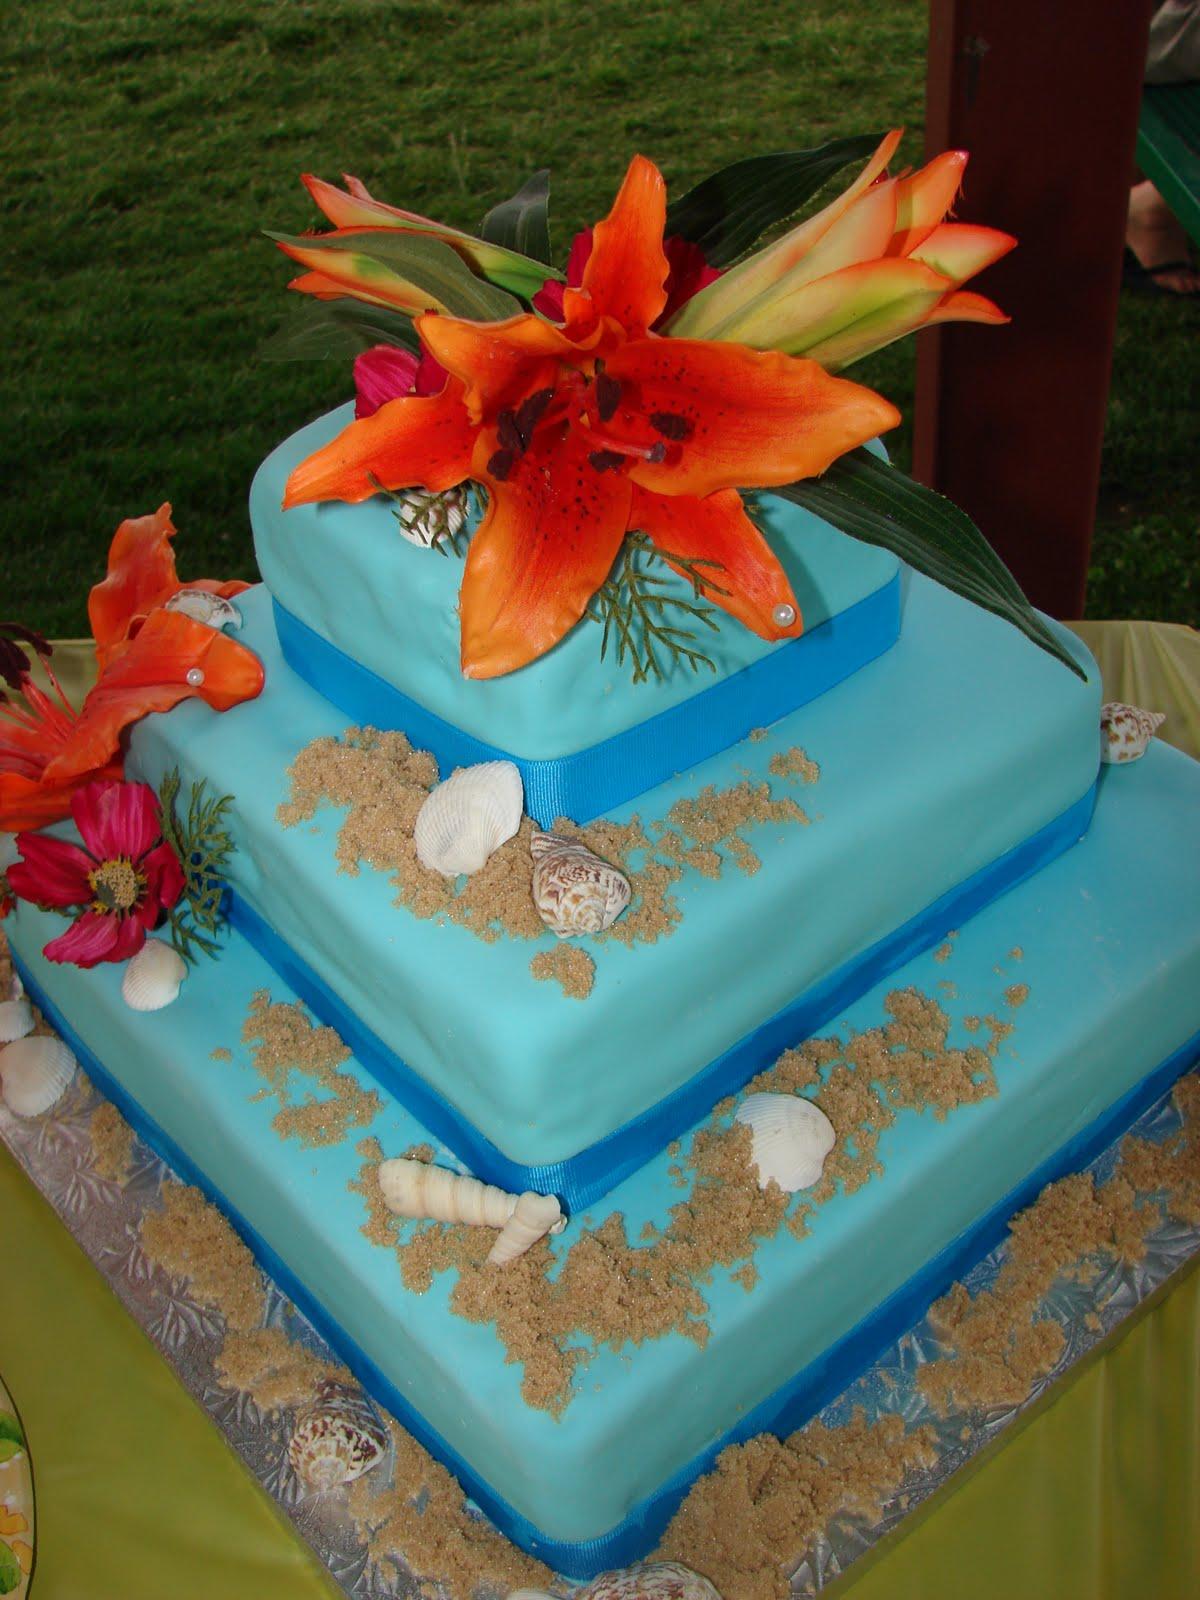 Heather's Creations: Luau theme cake, birthday